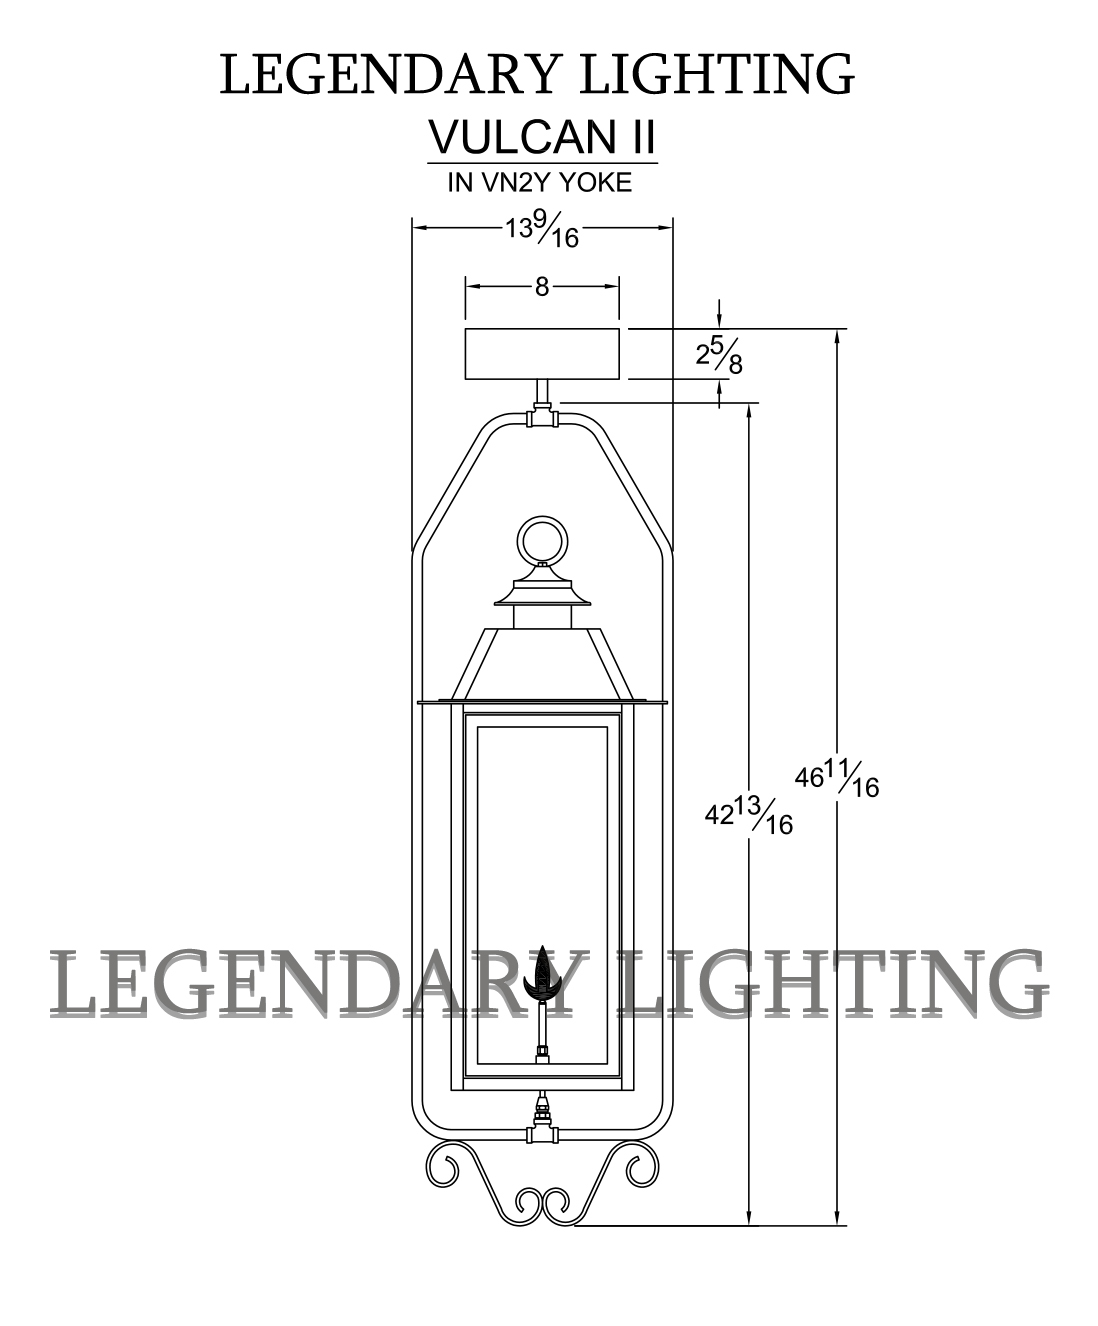 Vulcan Legendary Lighting Atlas Wiring Diagrams 2 Yoke